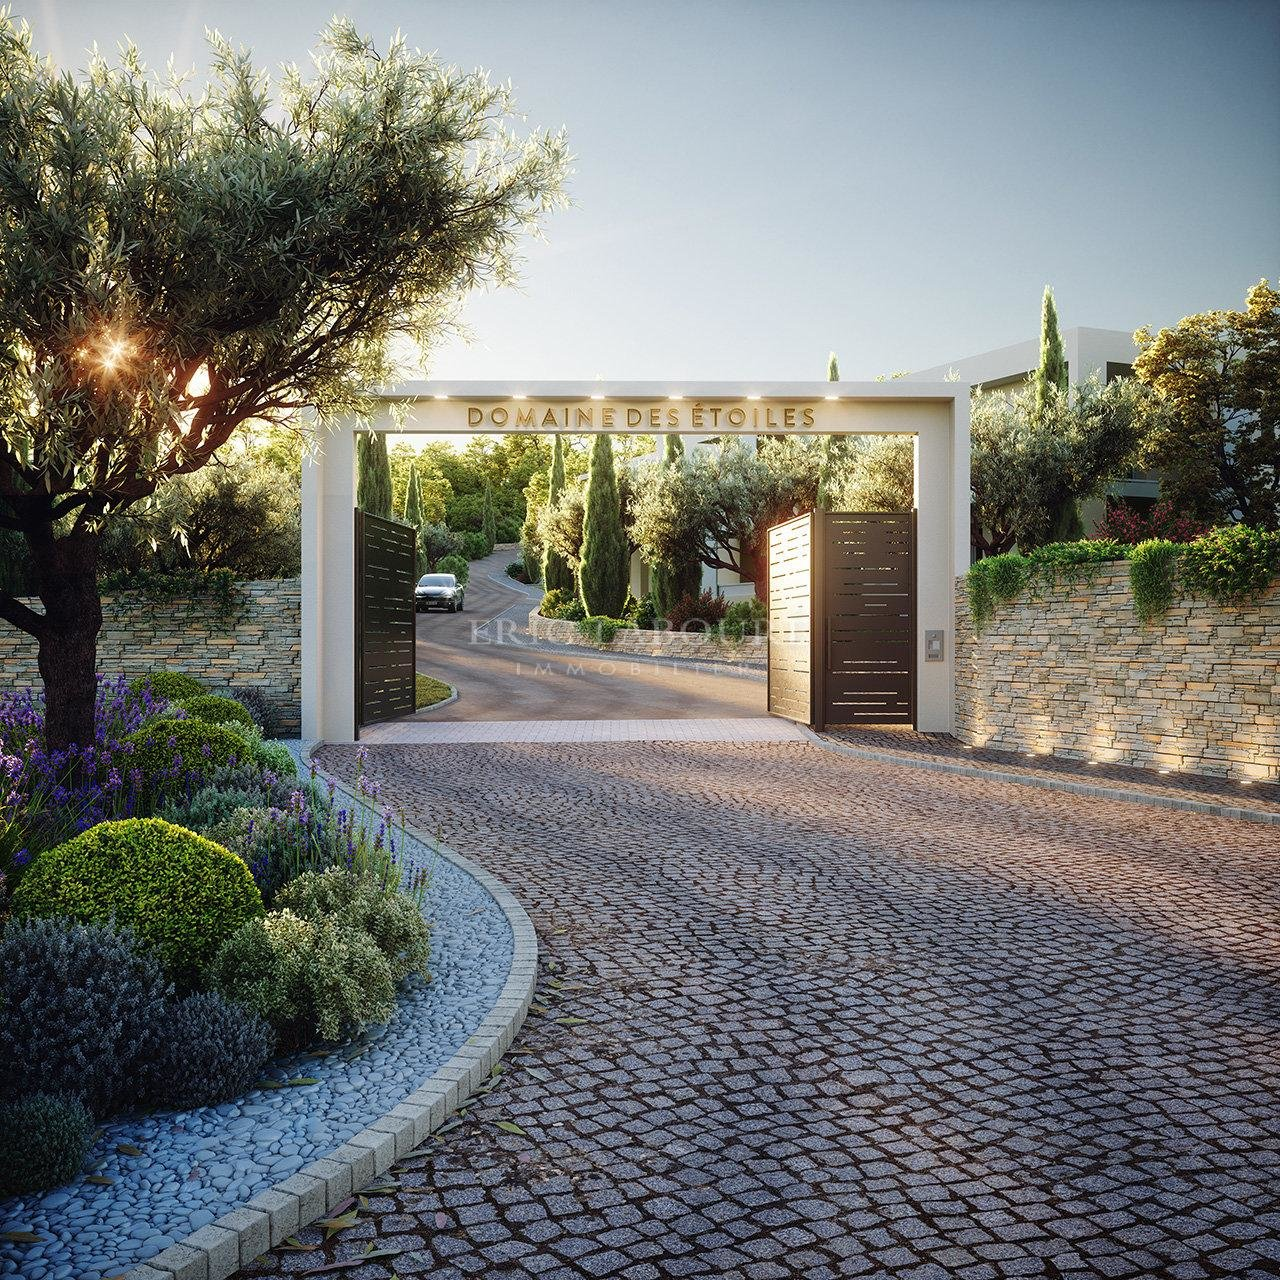 Mougins Residence Constellation - Vente Appartement NEUF 3P RDJ + 100m2 de jardin privatif